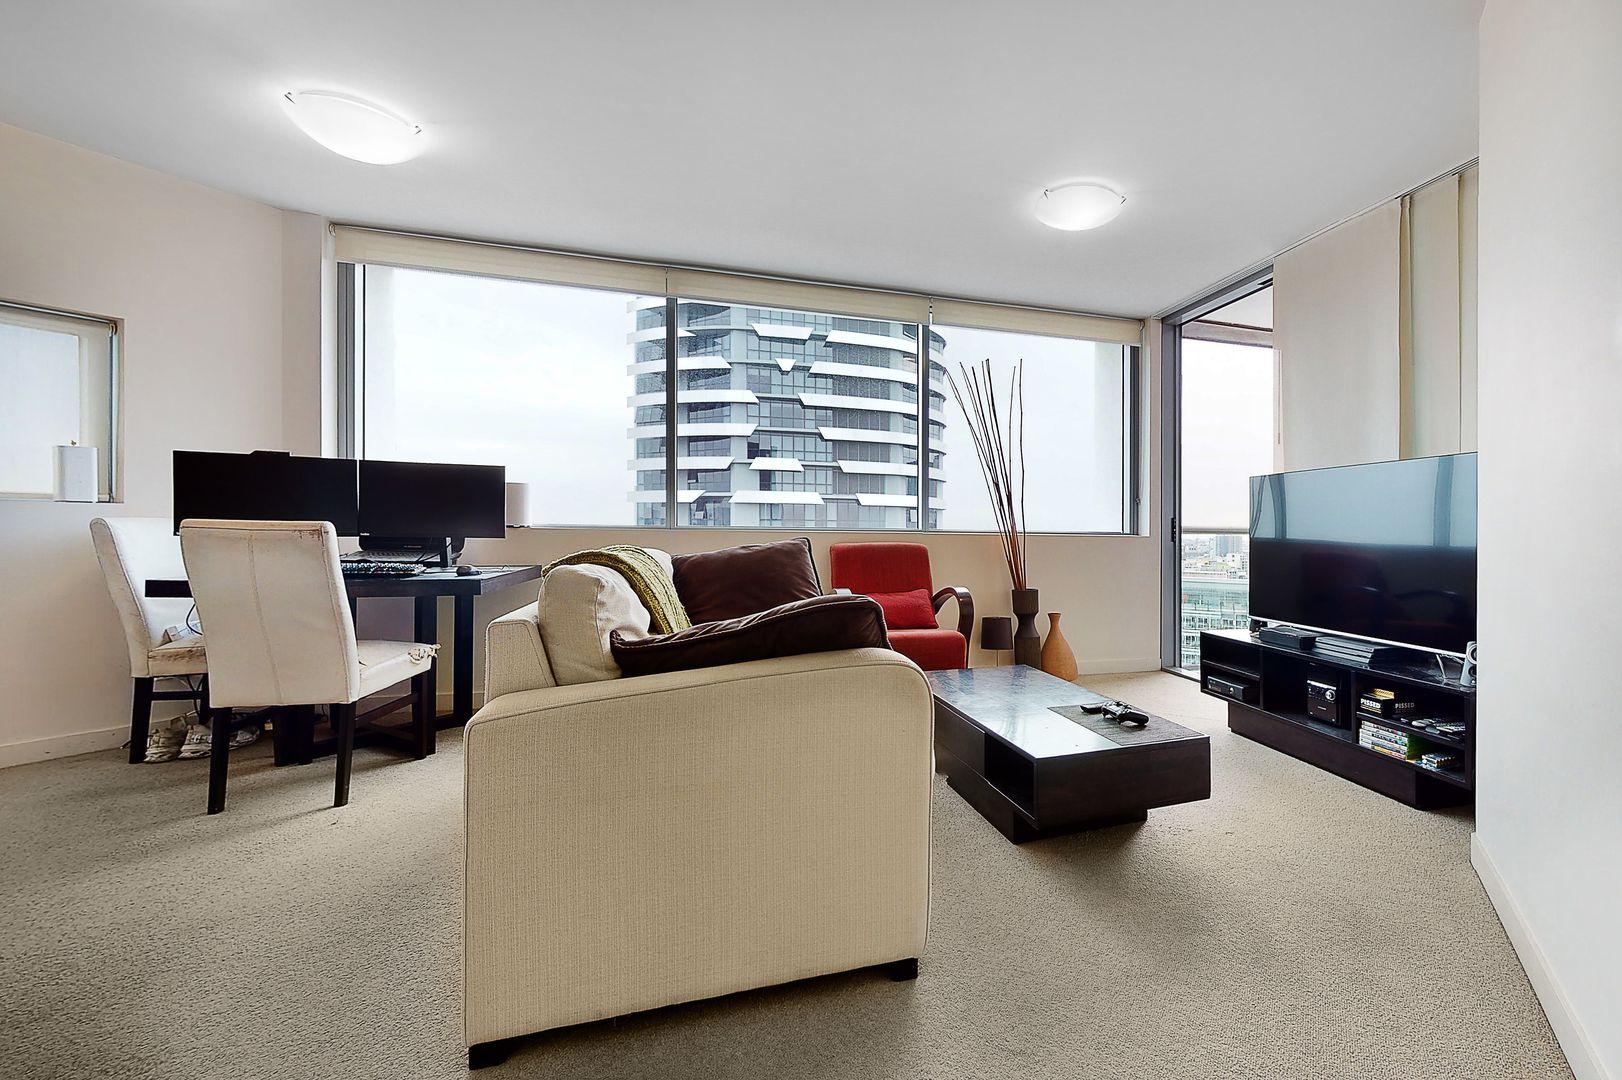 1 bedrooms Apartment / Unit / Flat in 341/18 Tank Street BRISBANE CITY QLD, 4000